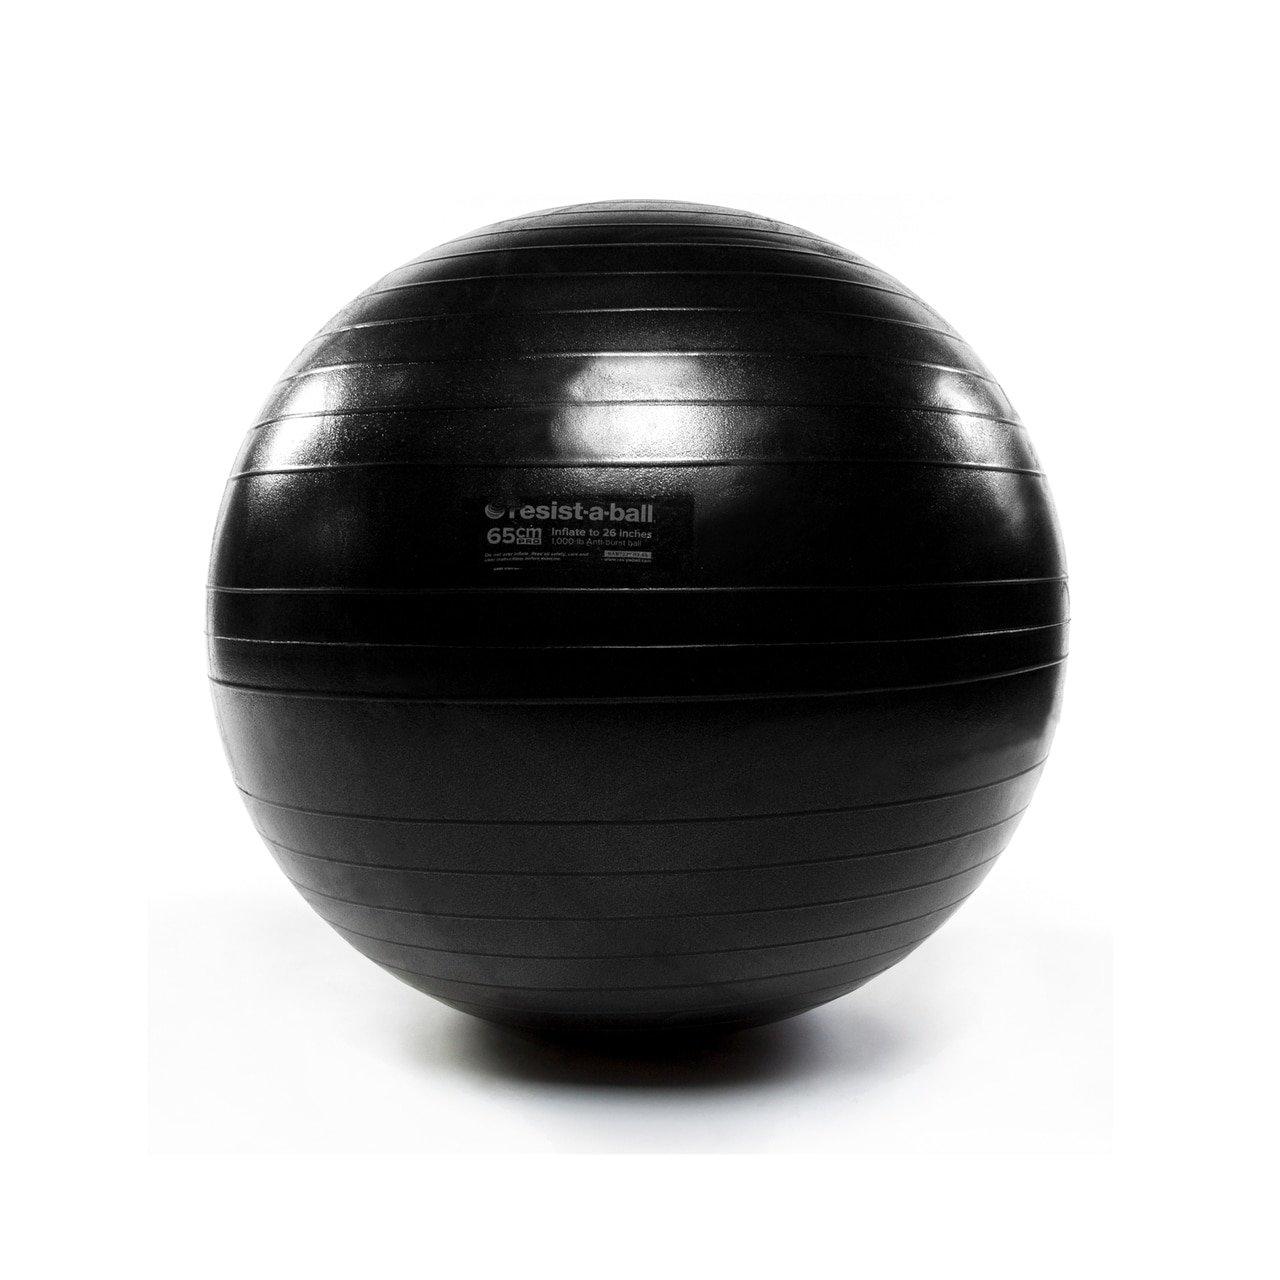 Peak Pilates Resist-A-Ball 65cm Pro Charcoal